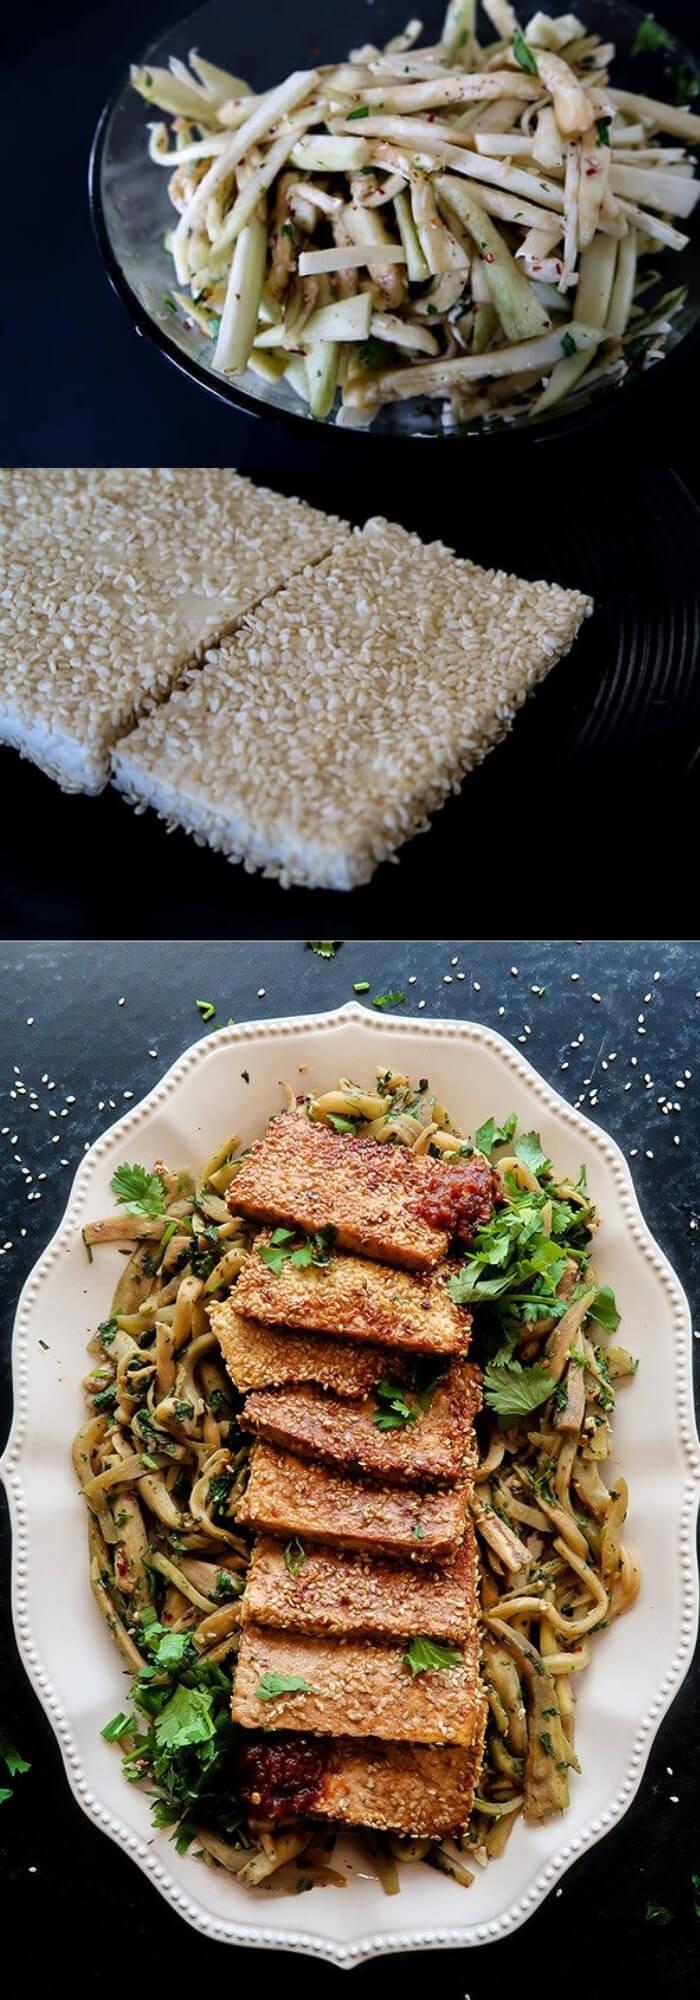 Keto Breakfast Vegetarian - Tofu and Eggplant